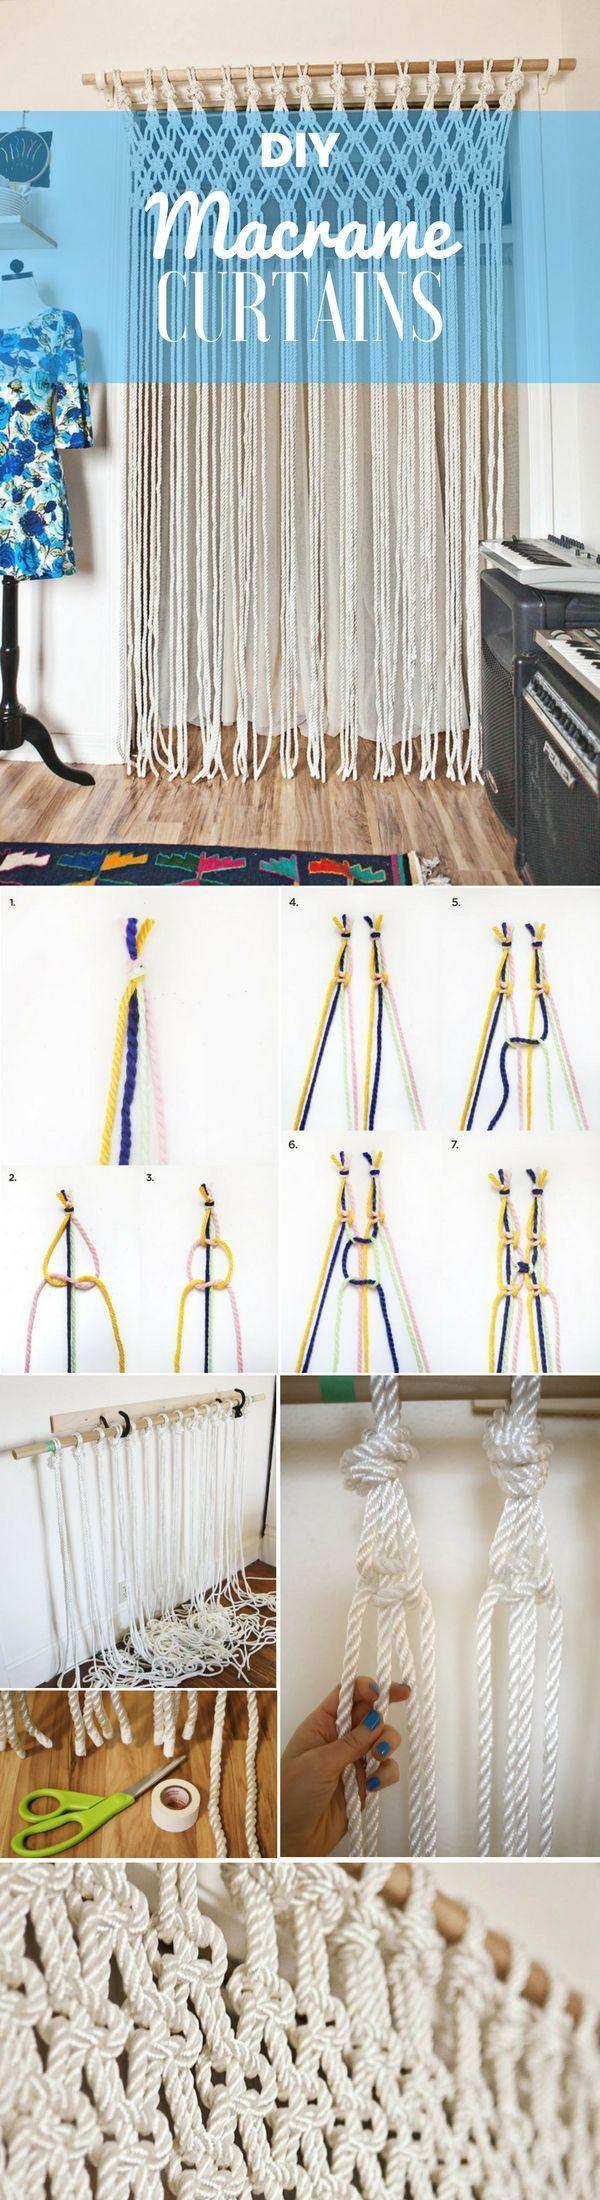 25 einzigartige makramee vorhang ideen auf pinterest perlenvorh nge makramee knoten und makram. Black Bedroom Furniture Sets. Home Design Ideas